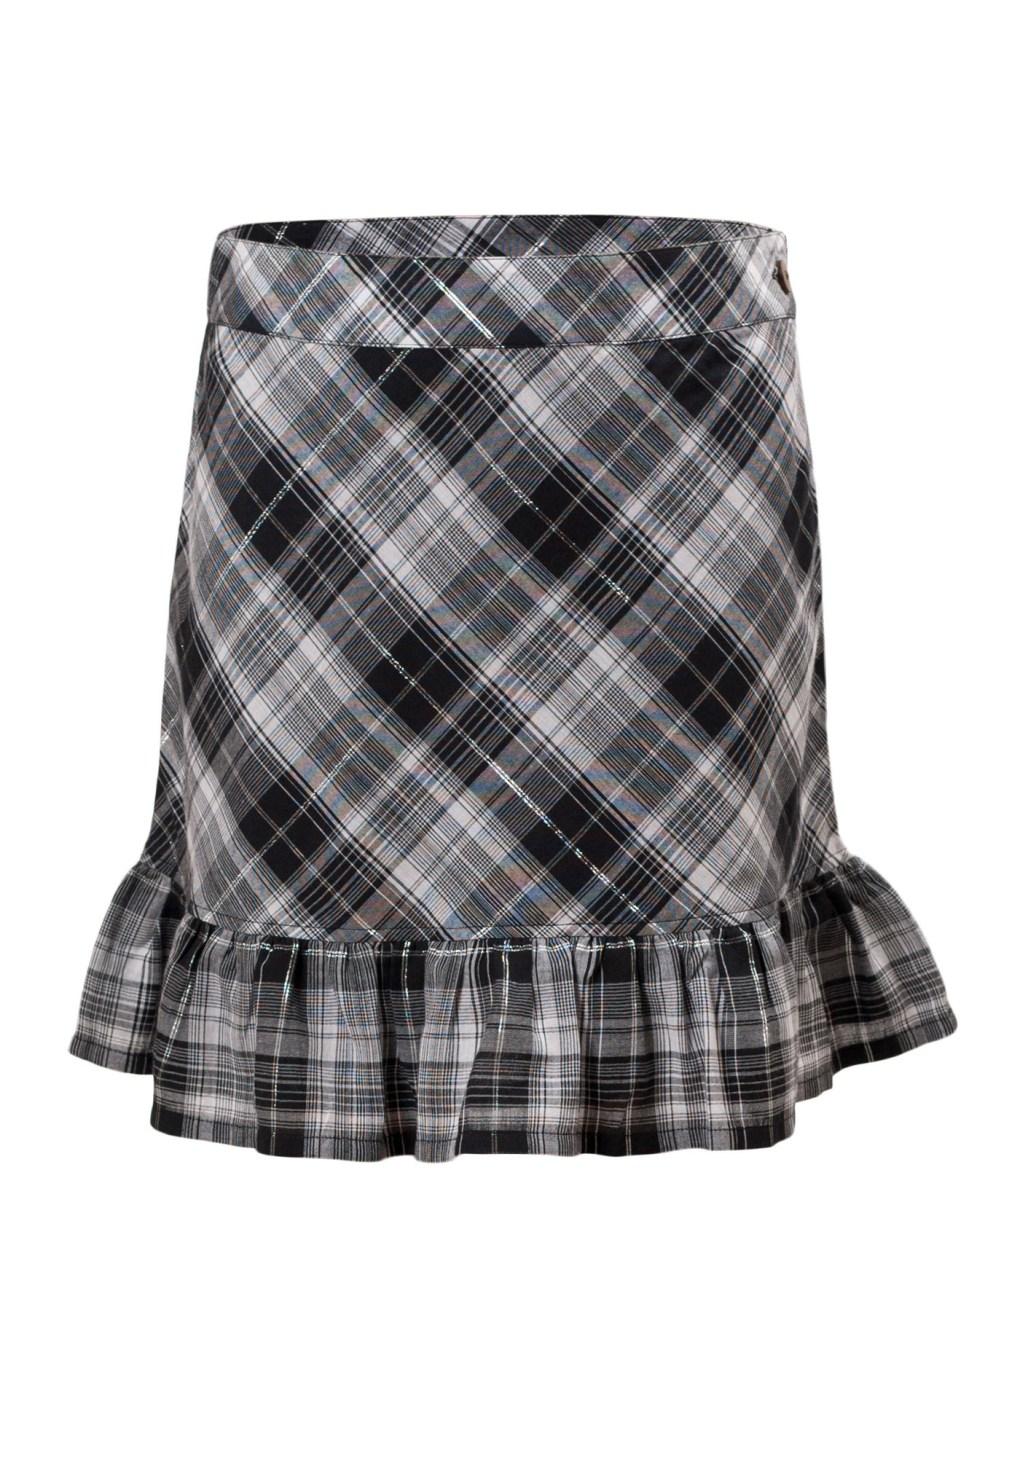 MINC Petite Elegant Girls Ruffle Skirt in Black and White Checks Cotton